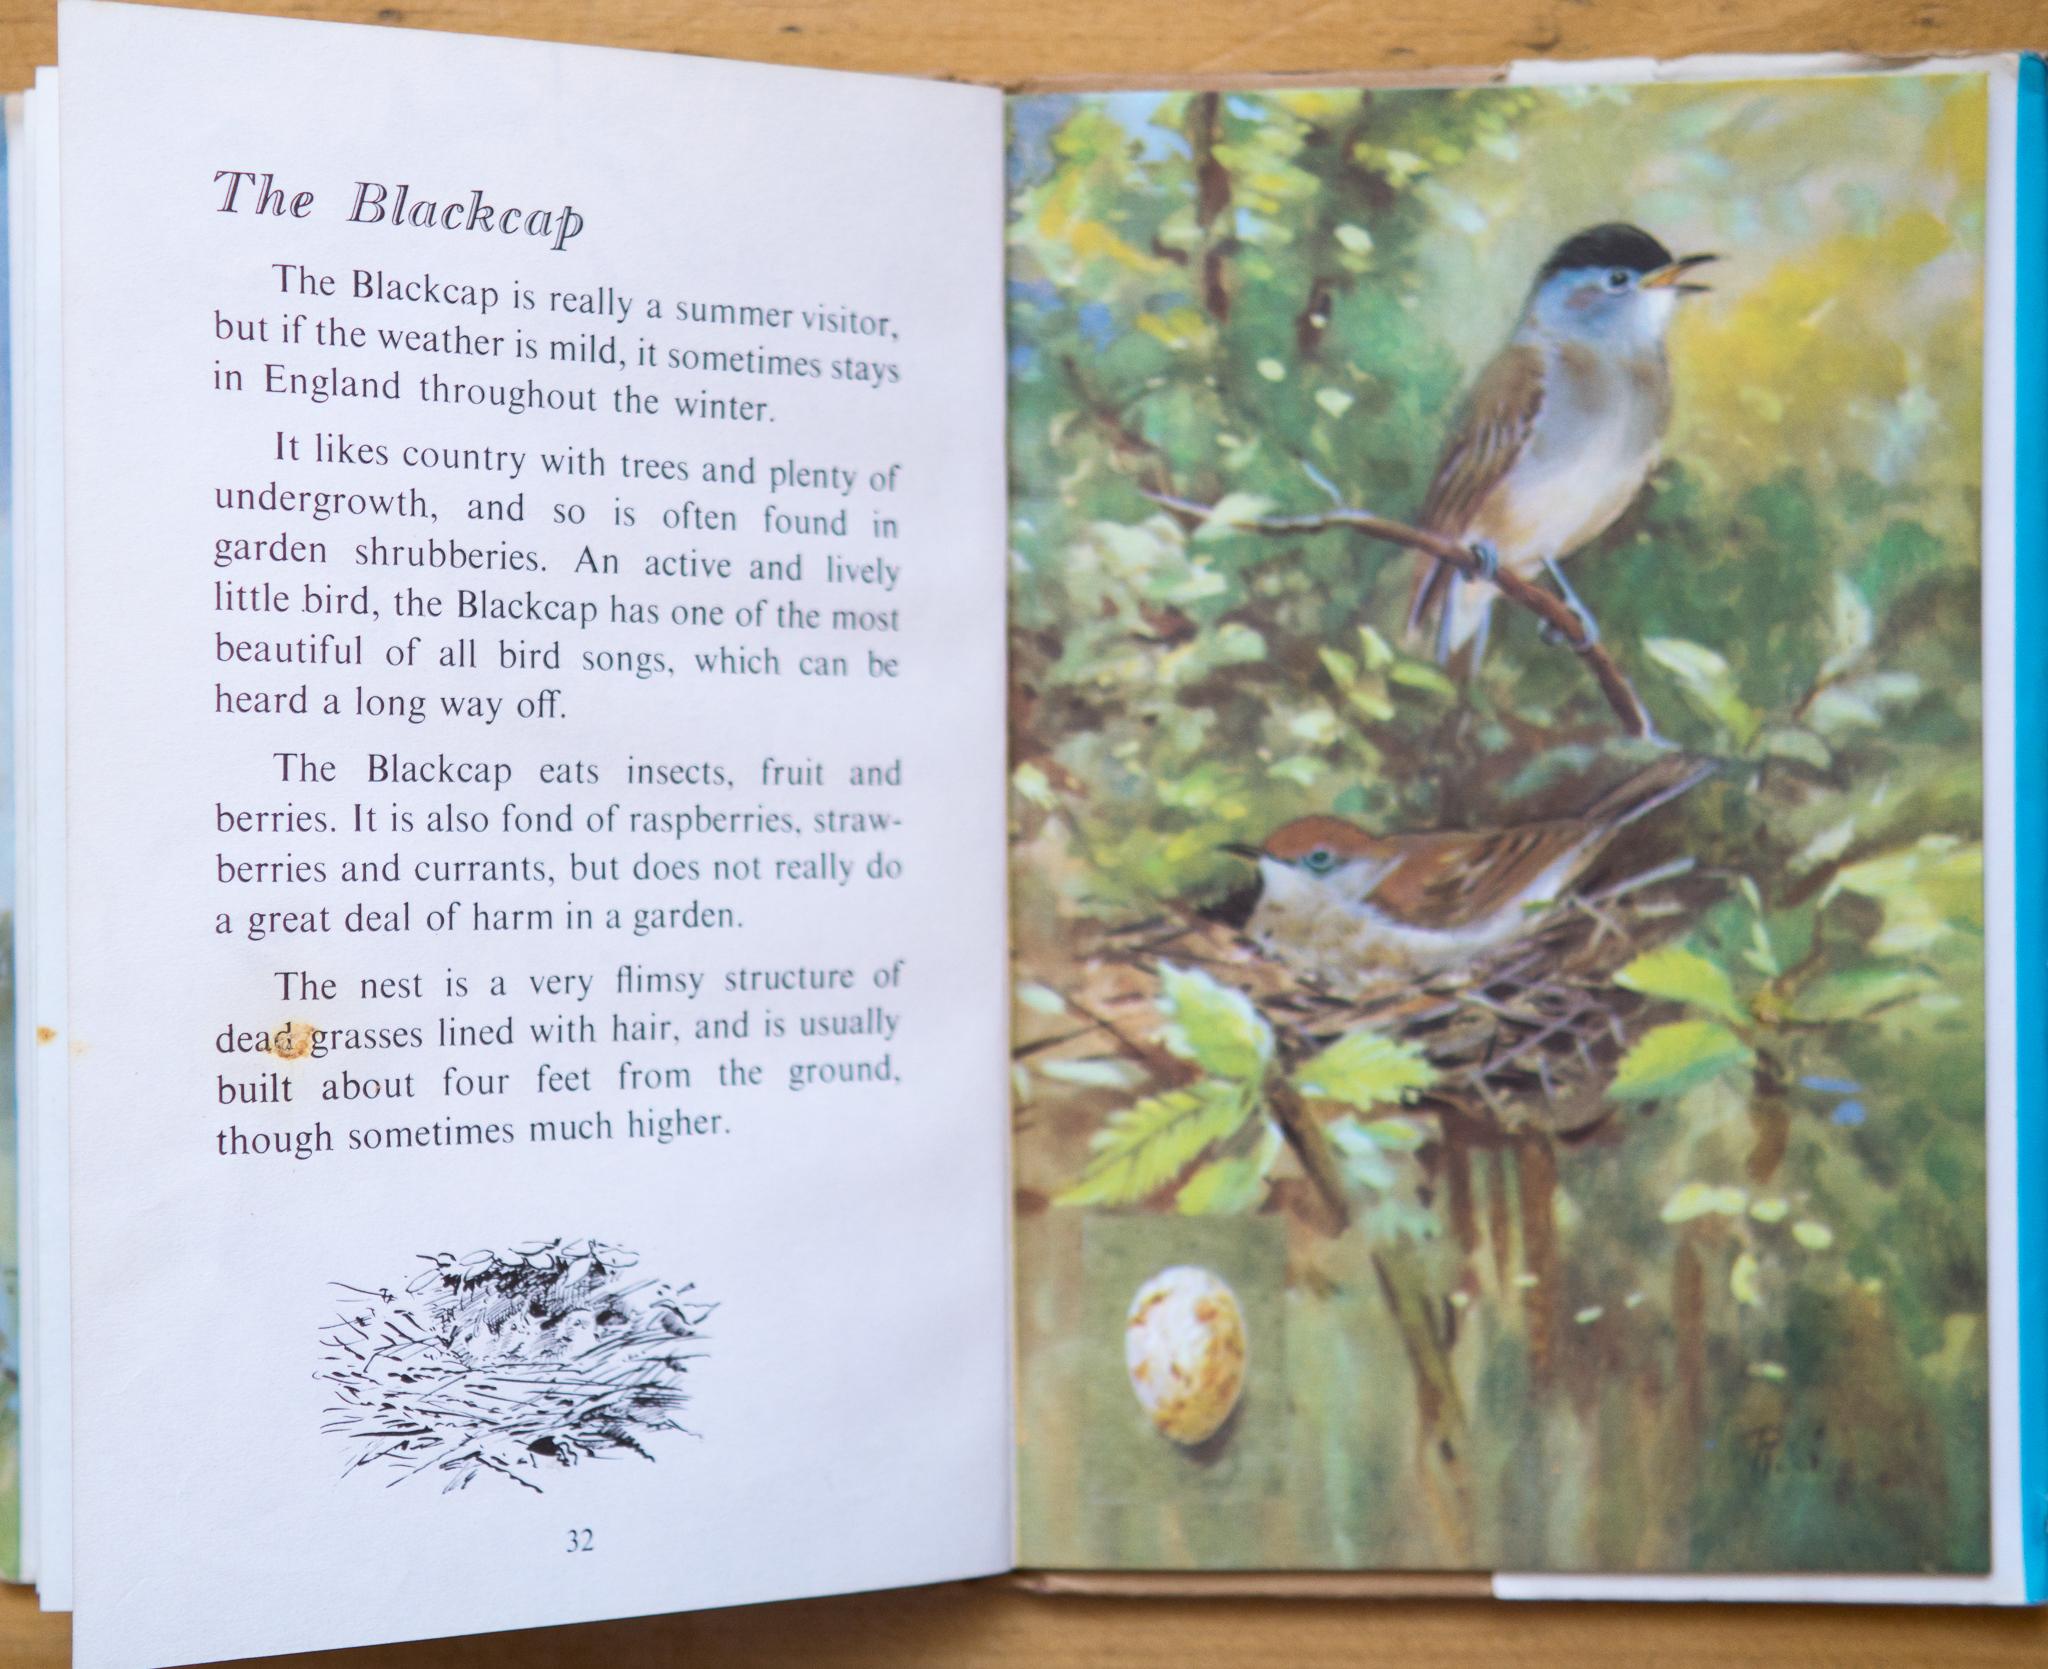 Blackcap - Ladybird Book of British Birds